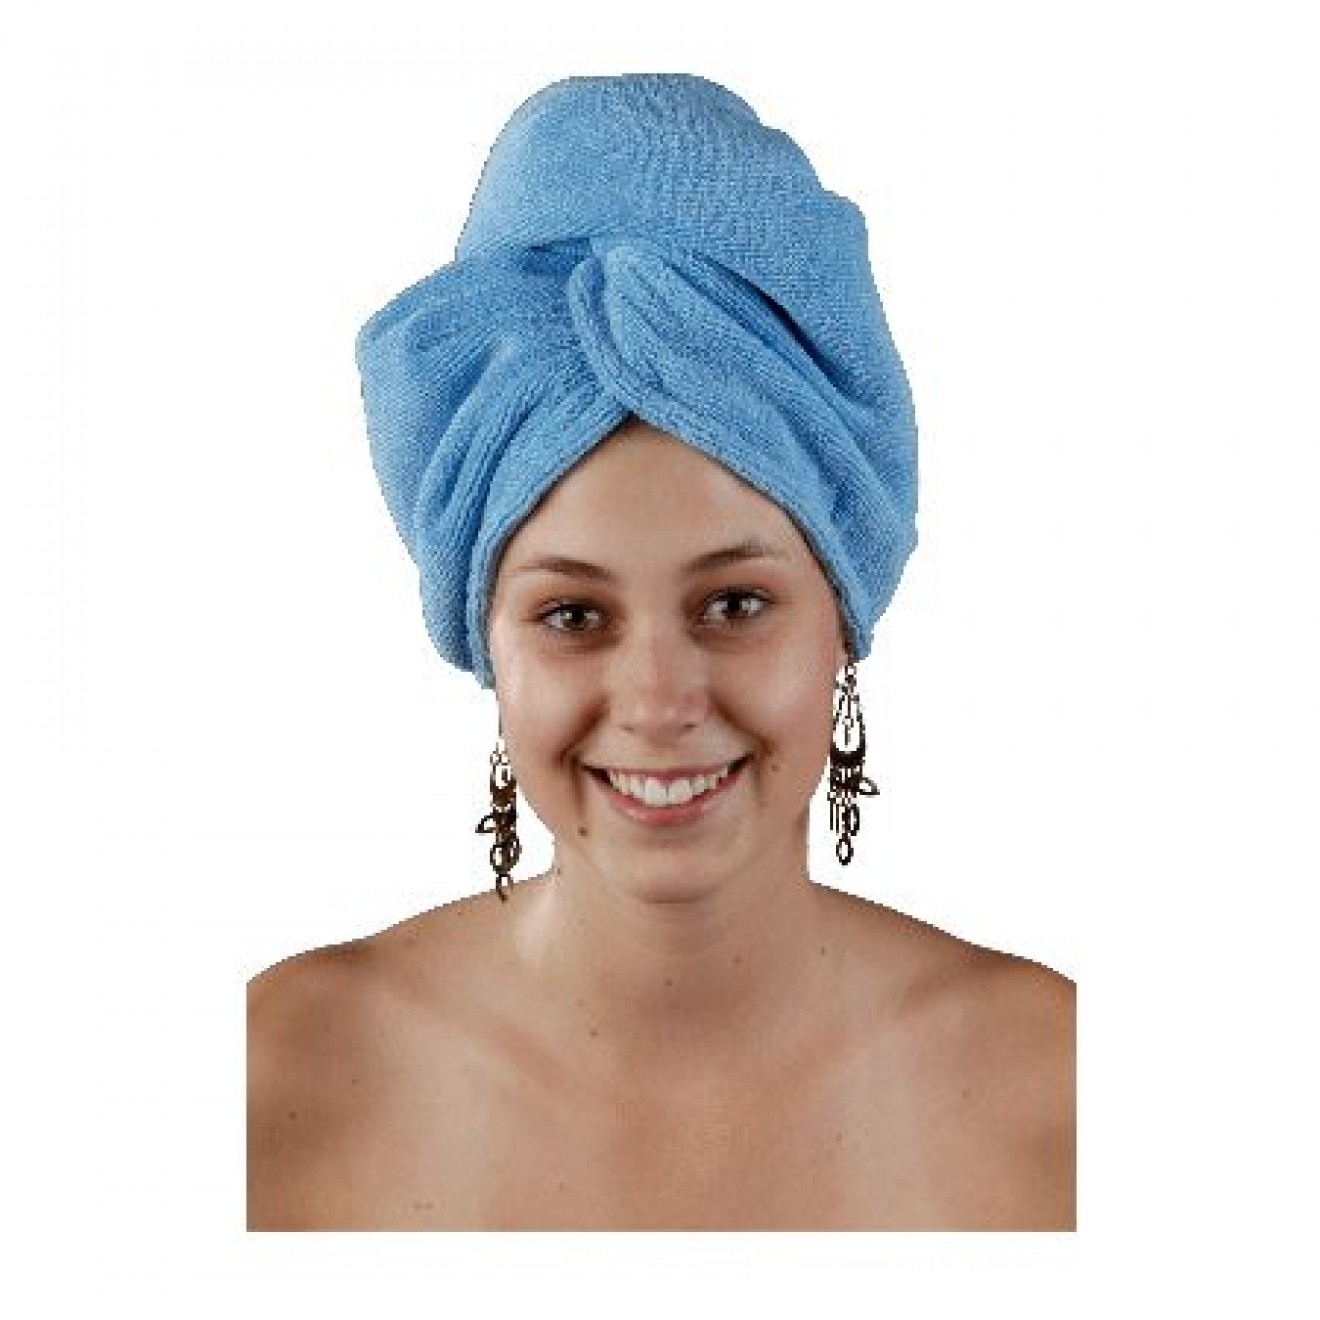 Image of CELMA 3000 Turban